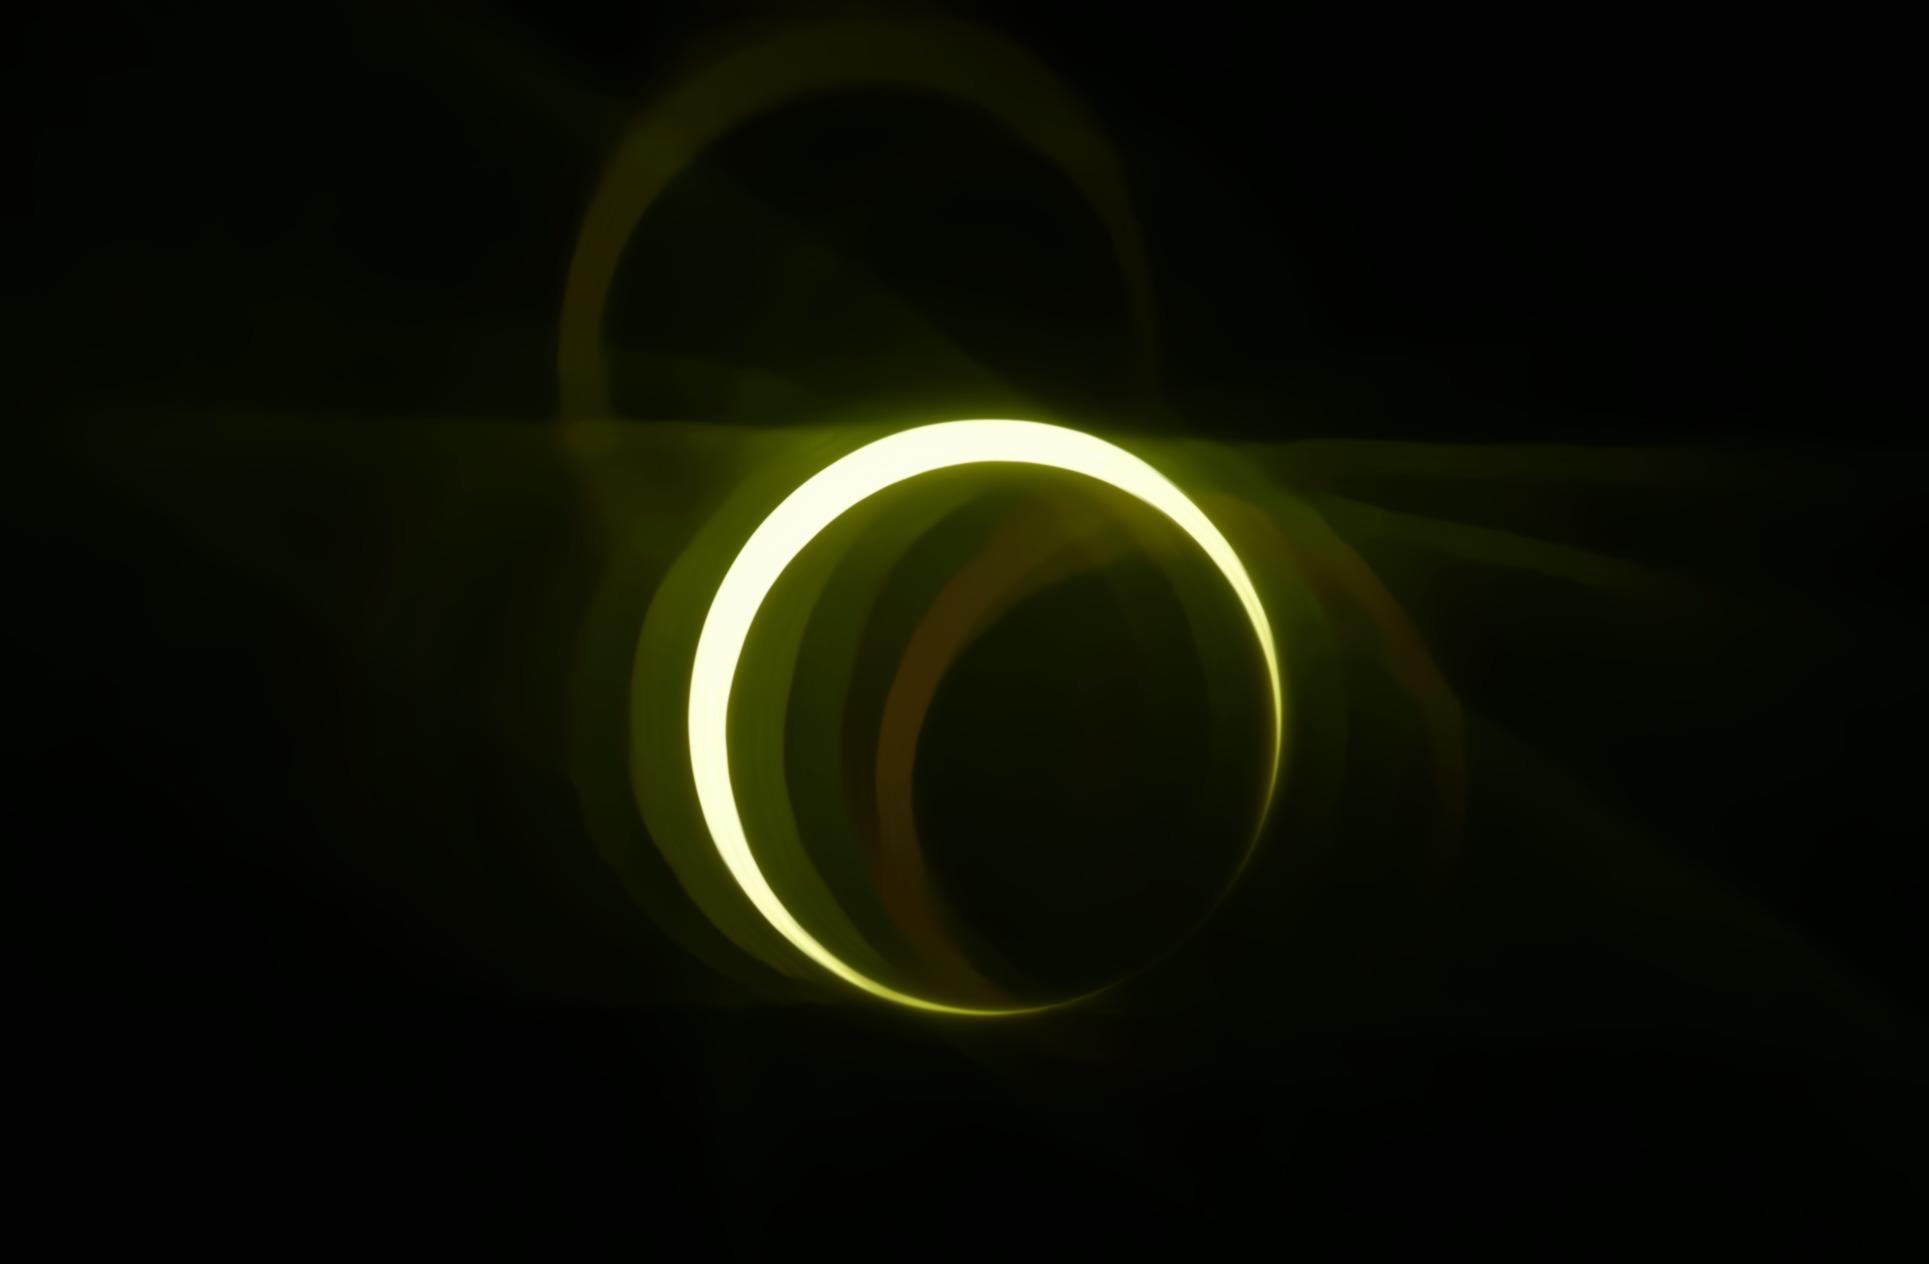 Eclipse photo taken by Adam Daly.